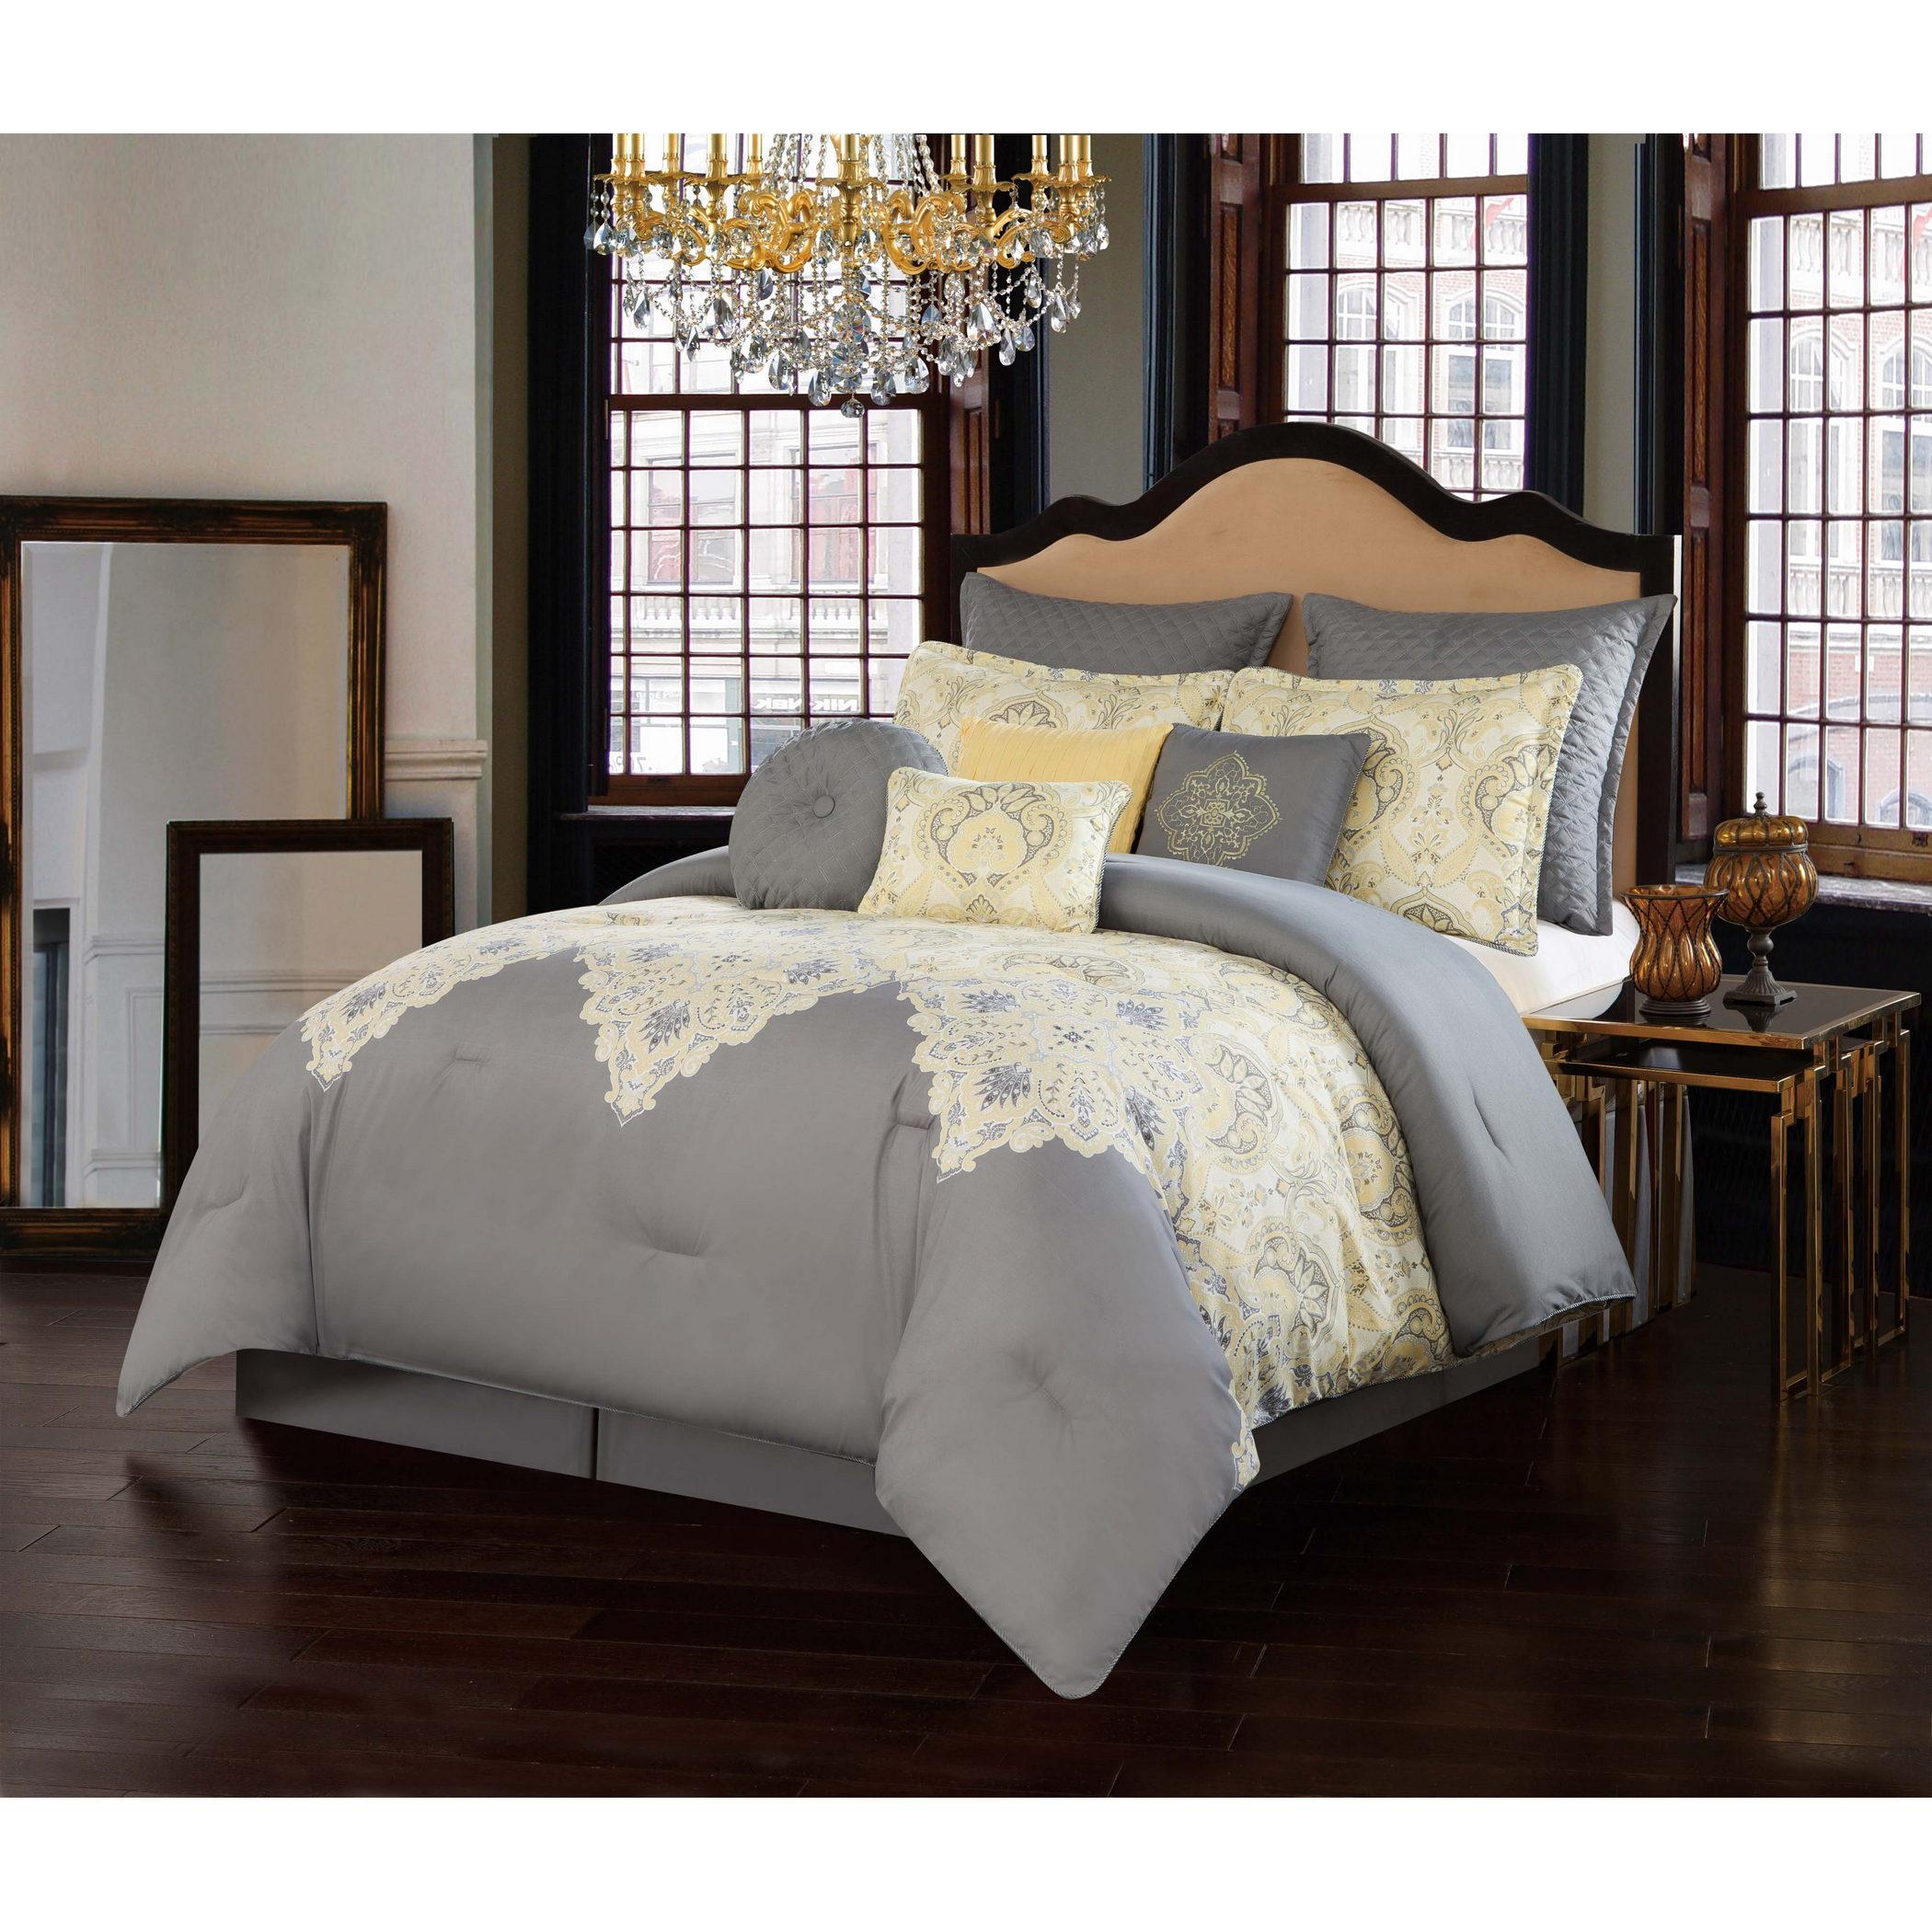 comforter snif king best for bed of cool trend sets design full men size and target sheets